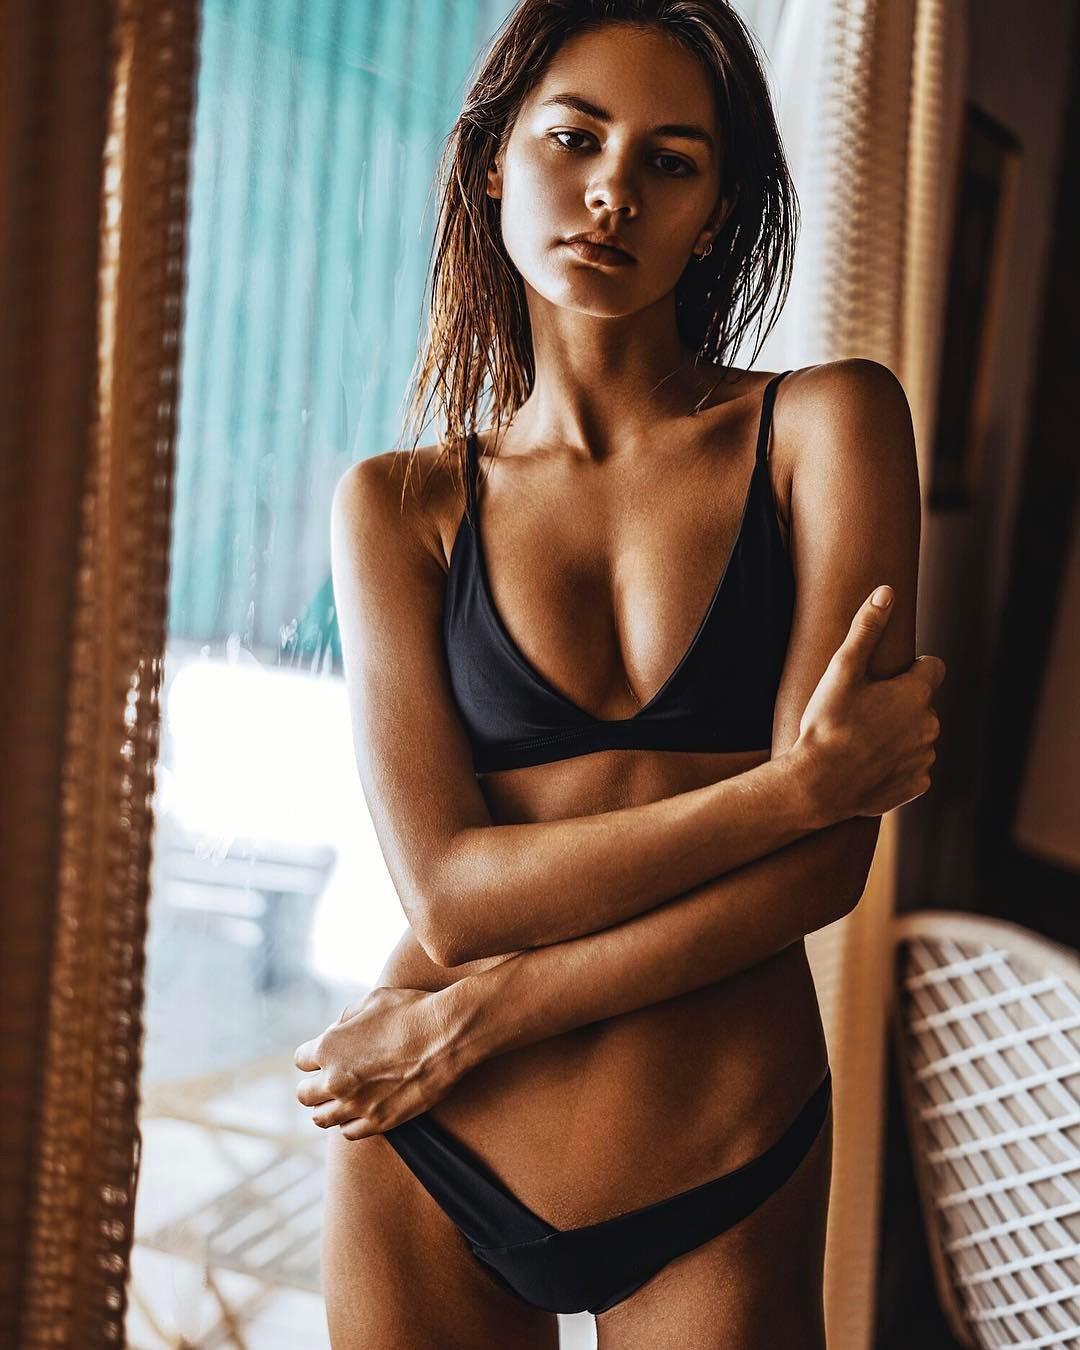 Sexy Frauen-Bikini-Satz 2018 Sommer-Fest-Verband-Bikini-Satz Push-up Padded Zwei Stücke brasilianische Badeanzug-Badebekleidung